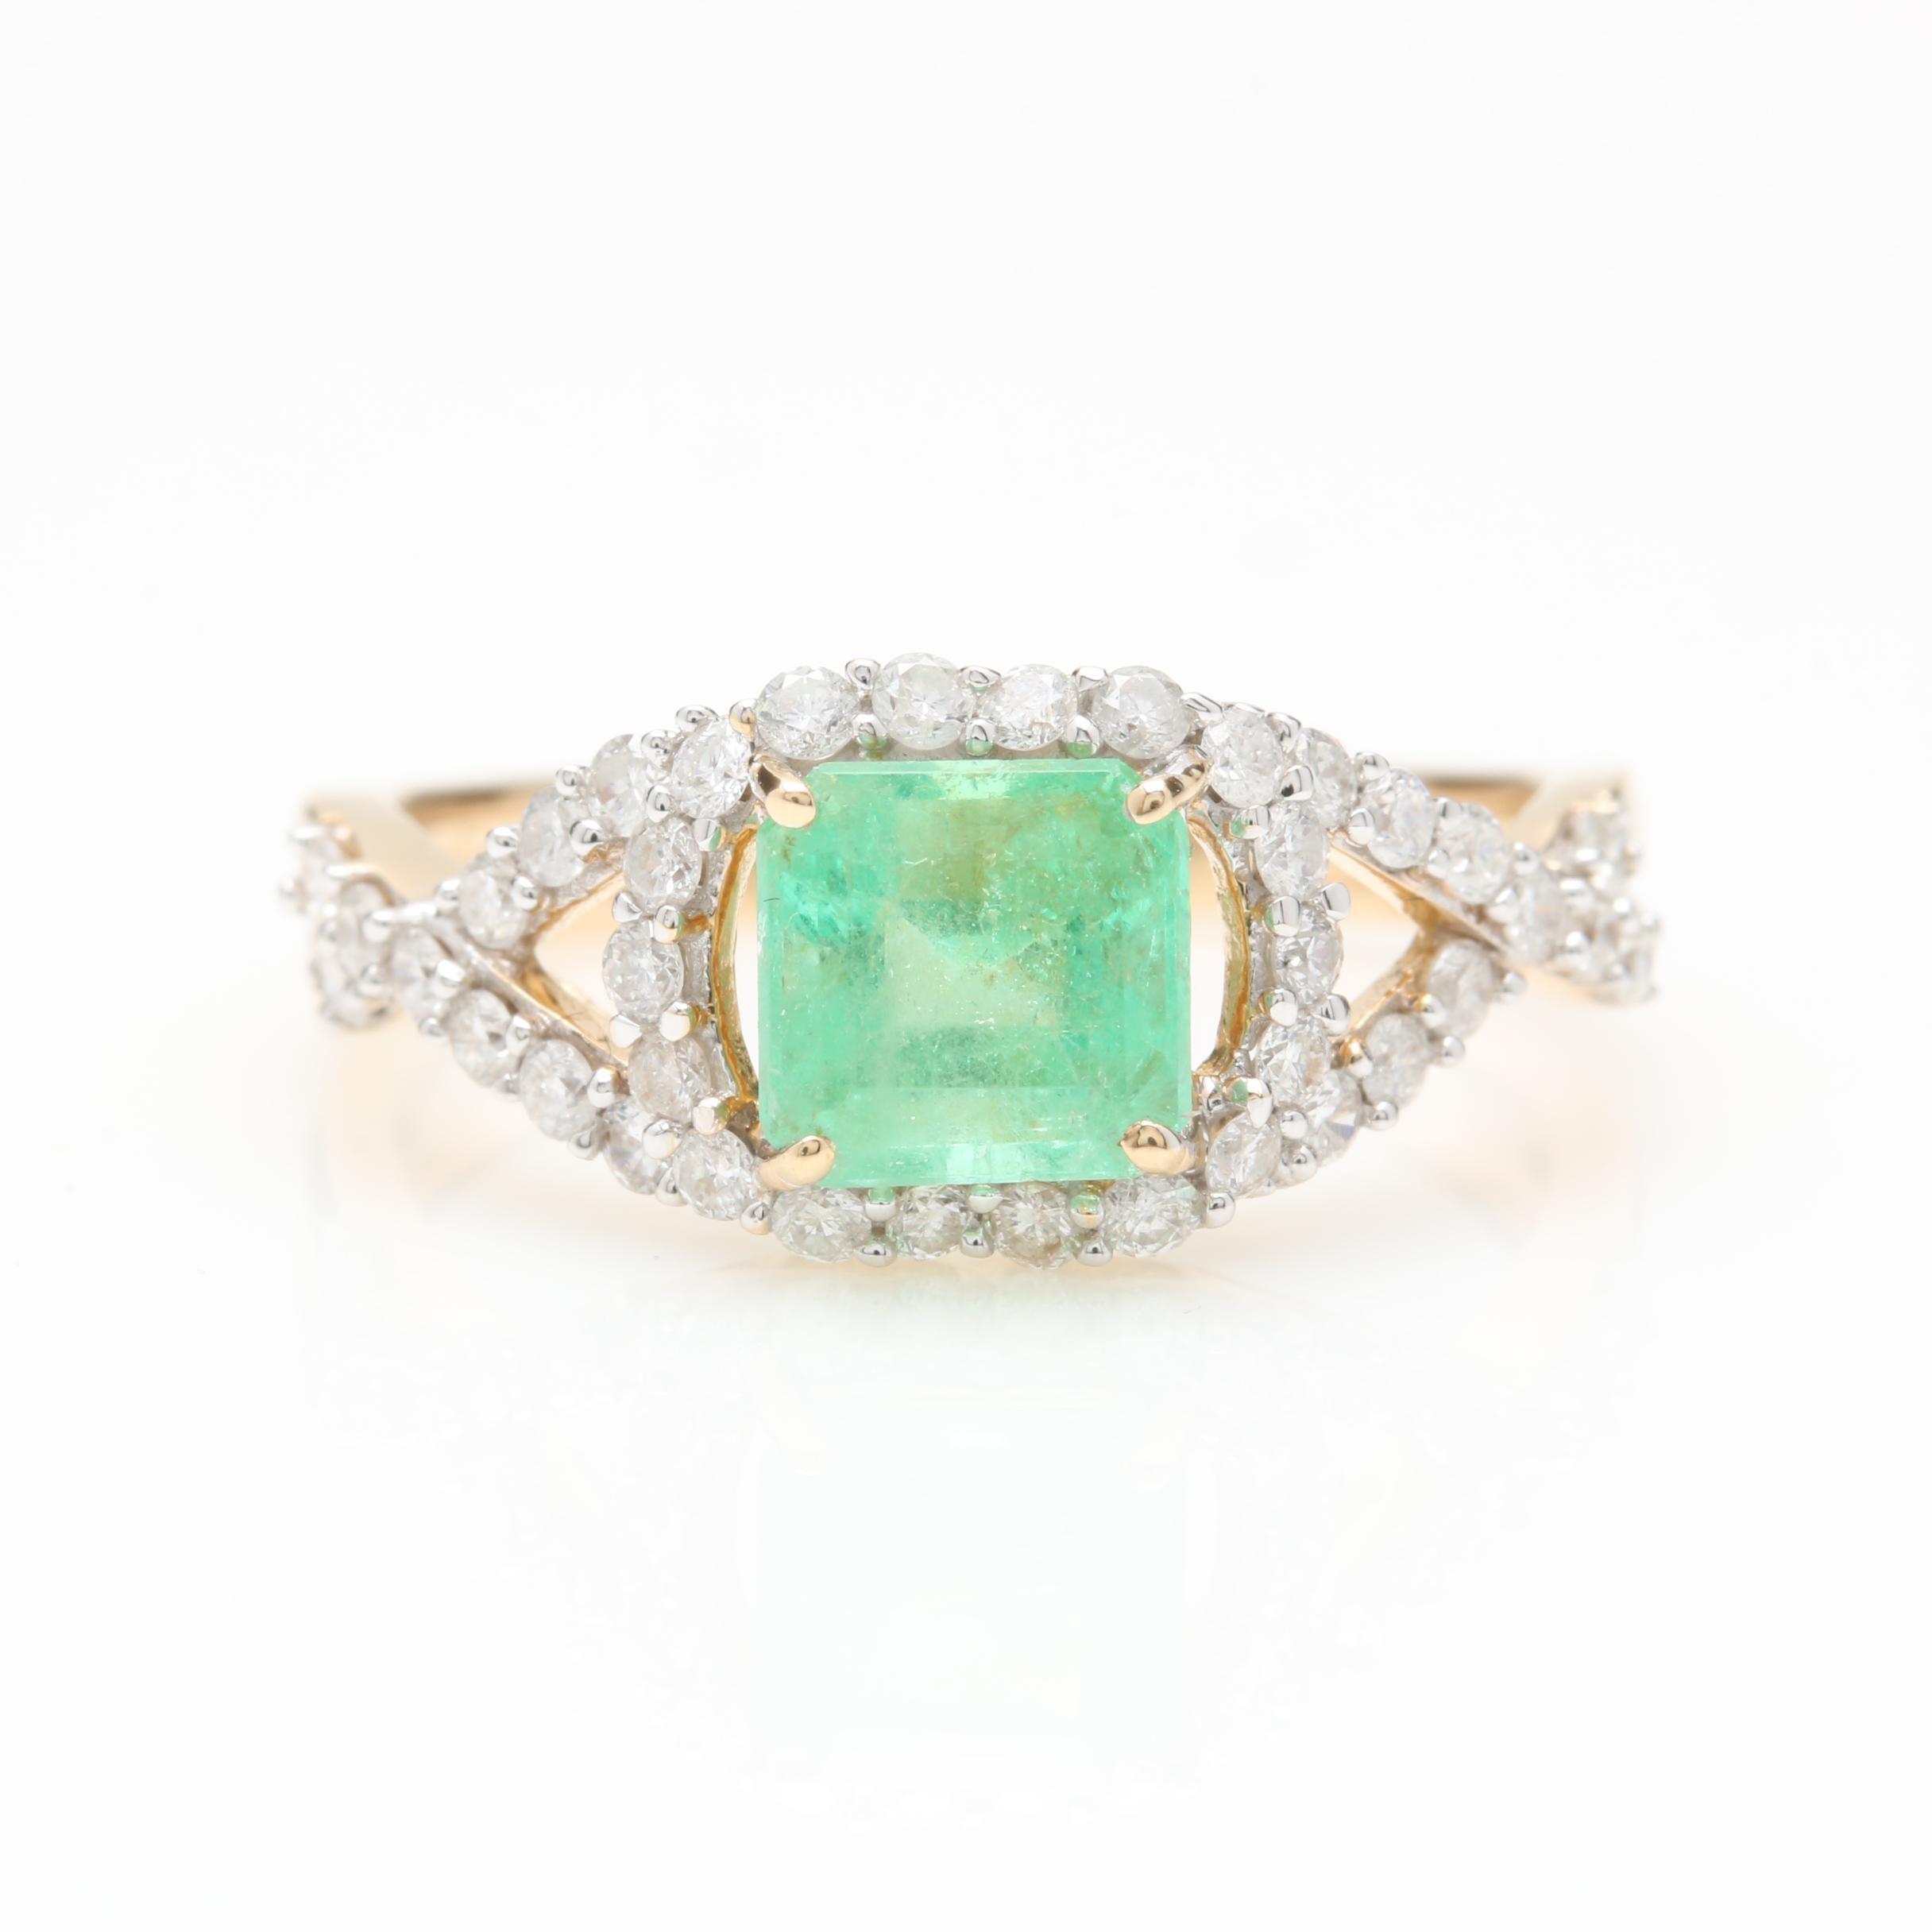 14K Yellow Gold 1.08 CT Emerald and Diamond Ring